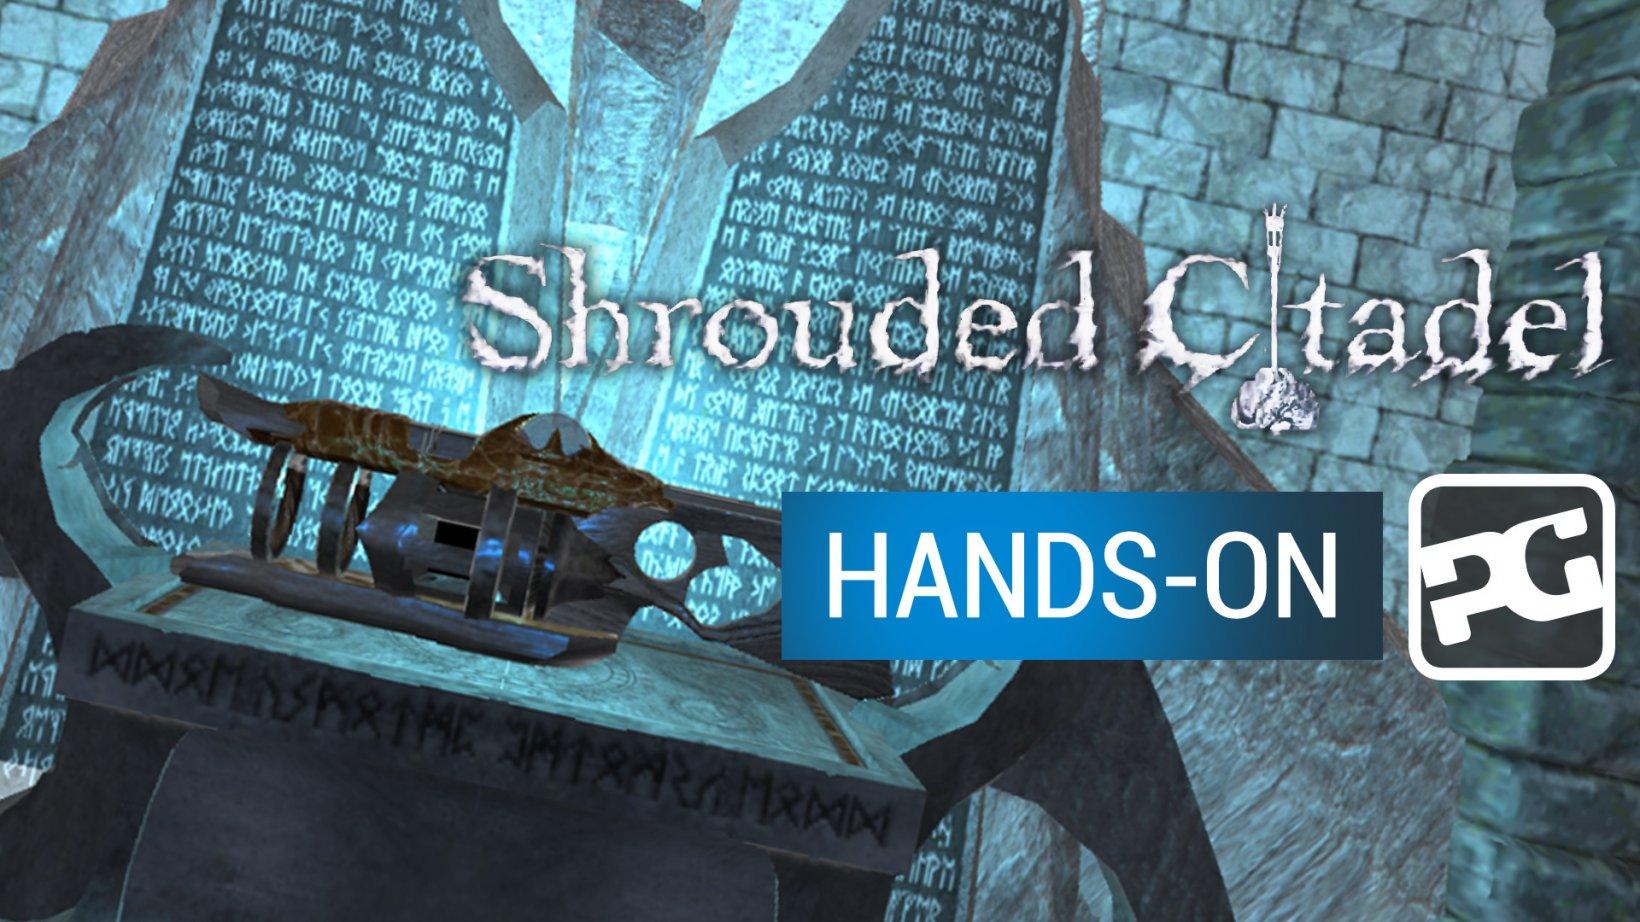 Shrouded Citadel - gameplay video